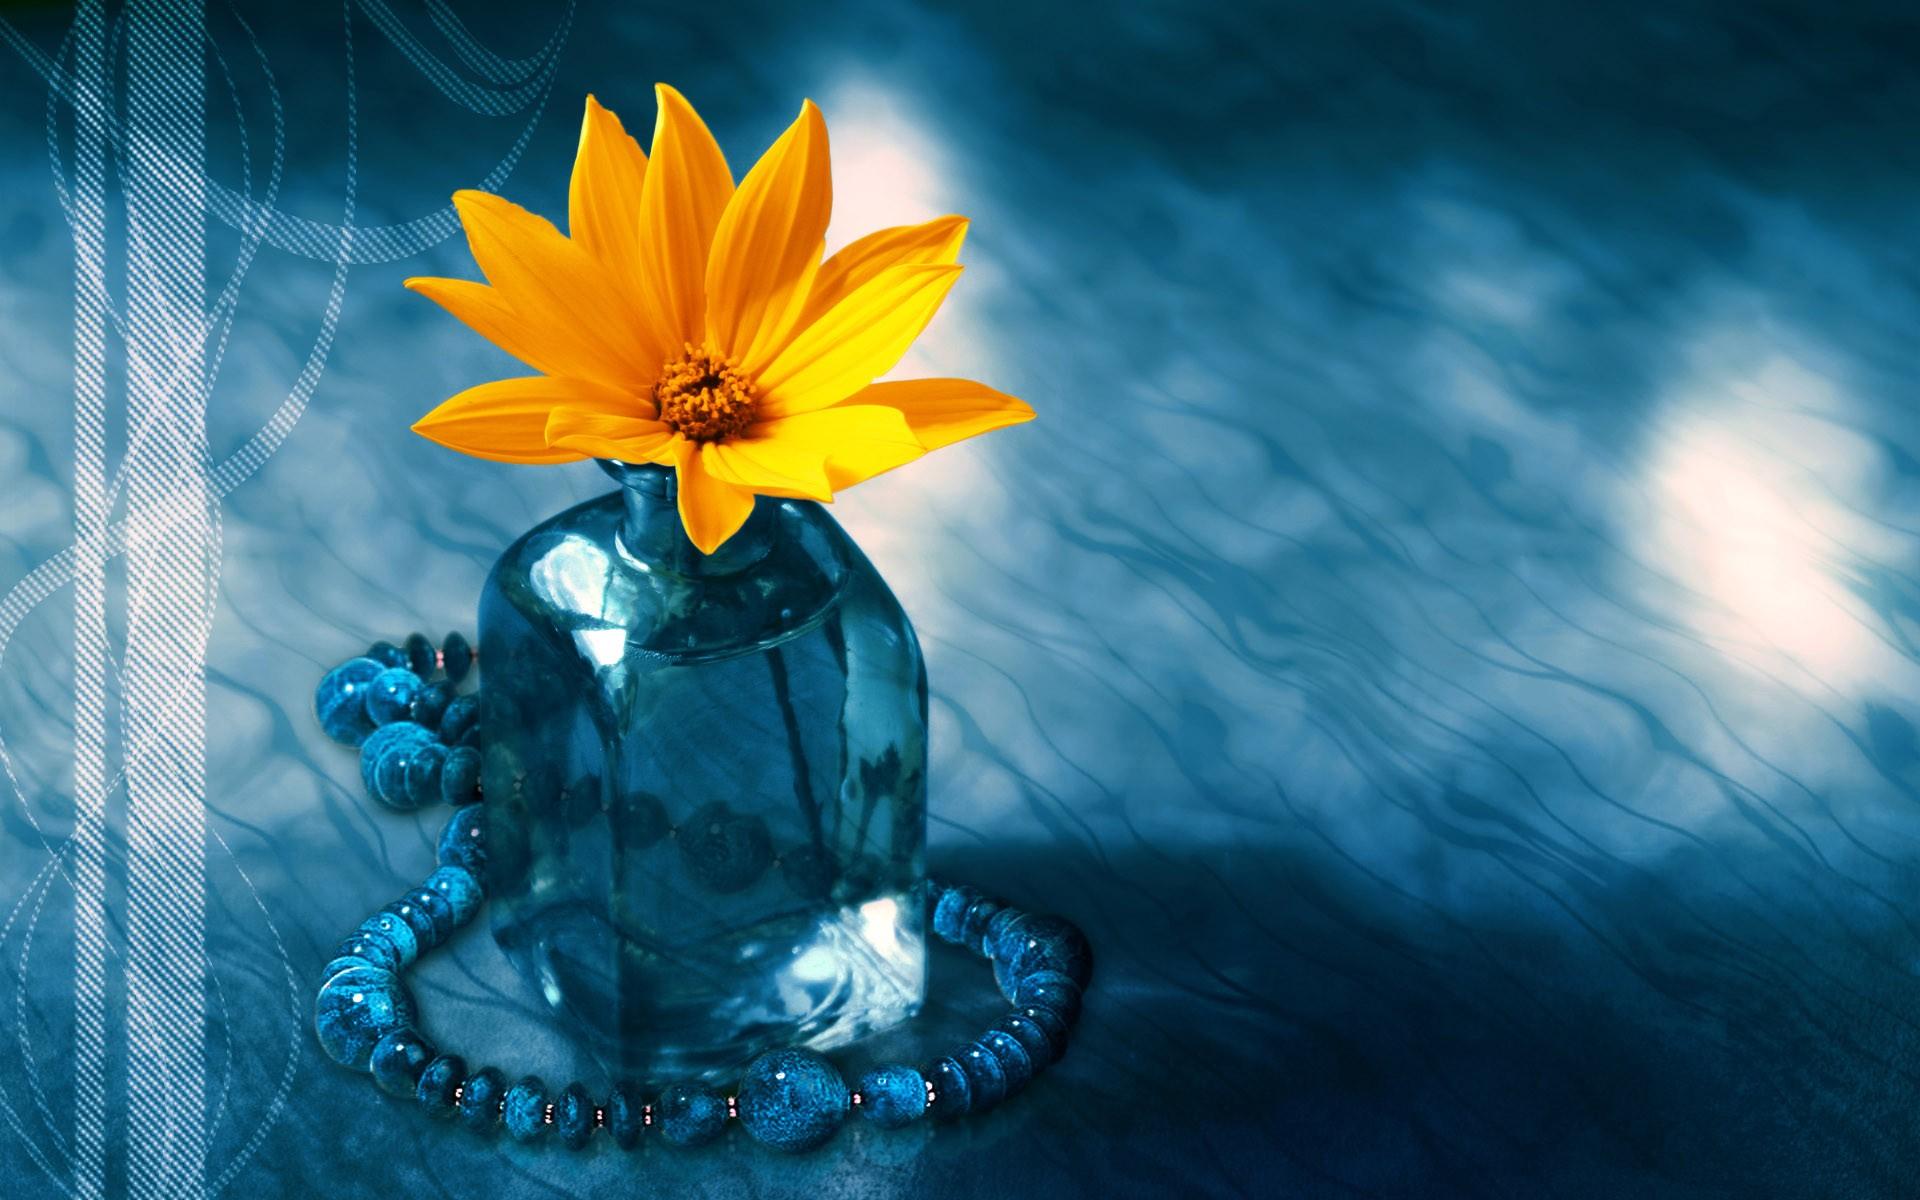 Yellow Flower In A Vase Hd Wallpaper